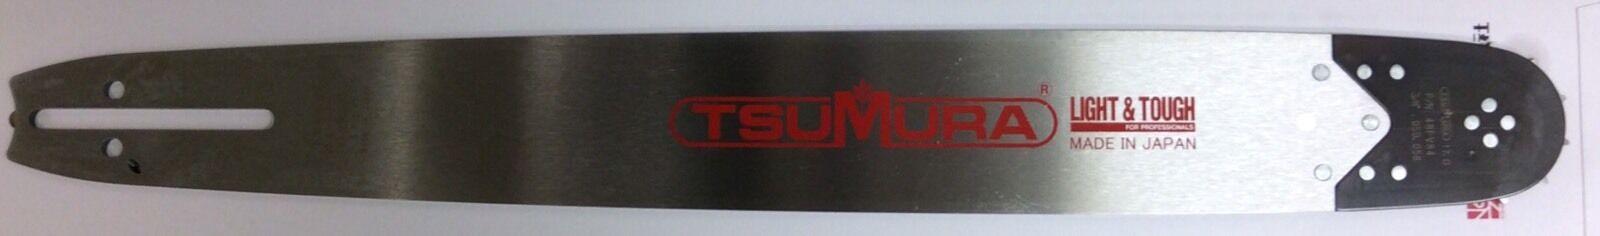 Guía de Tsumura 20  Bar 3 8-050-72DL Repl. Dolmar PS460 5100S 5105 6100 200 rndk 095